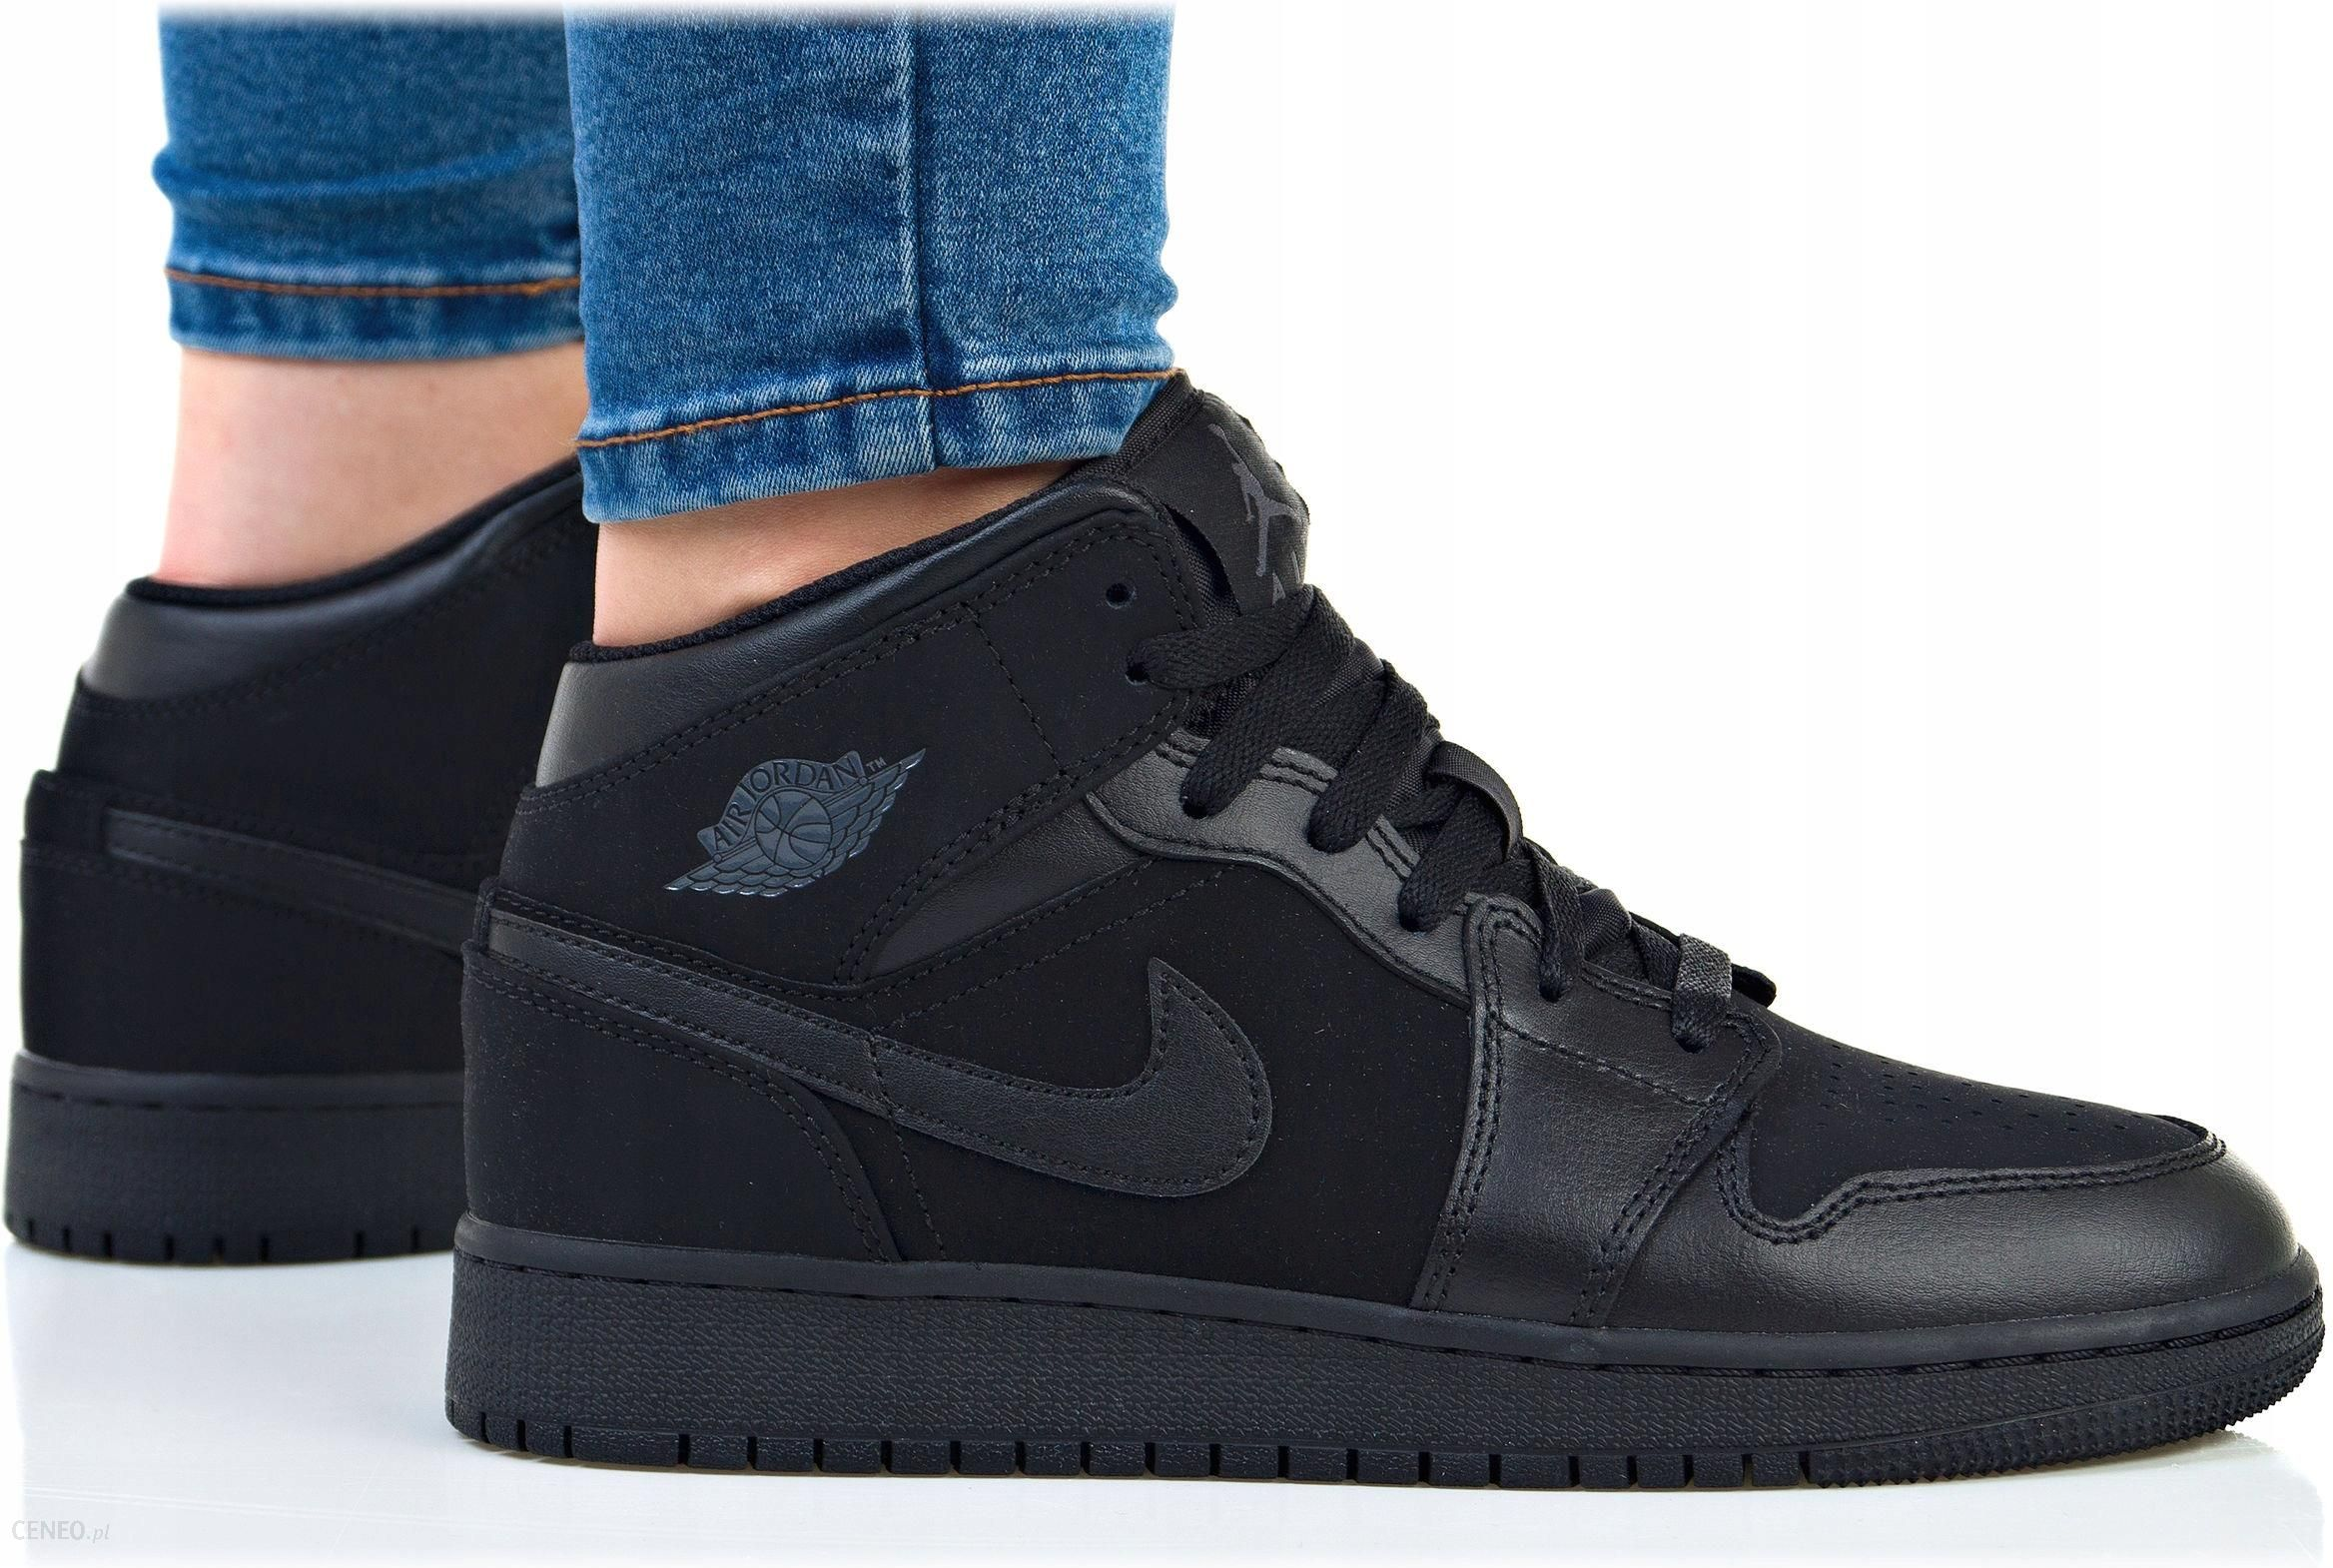 Buty Nike Damskie Air Jordan 1 MID Bg 554725 050 Ceny i opinie Ceneo.pl